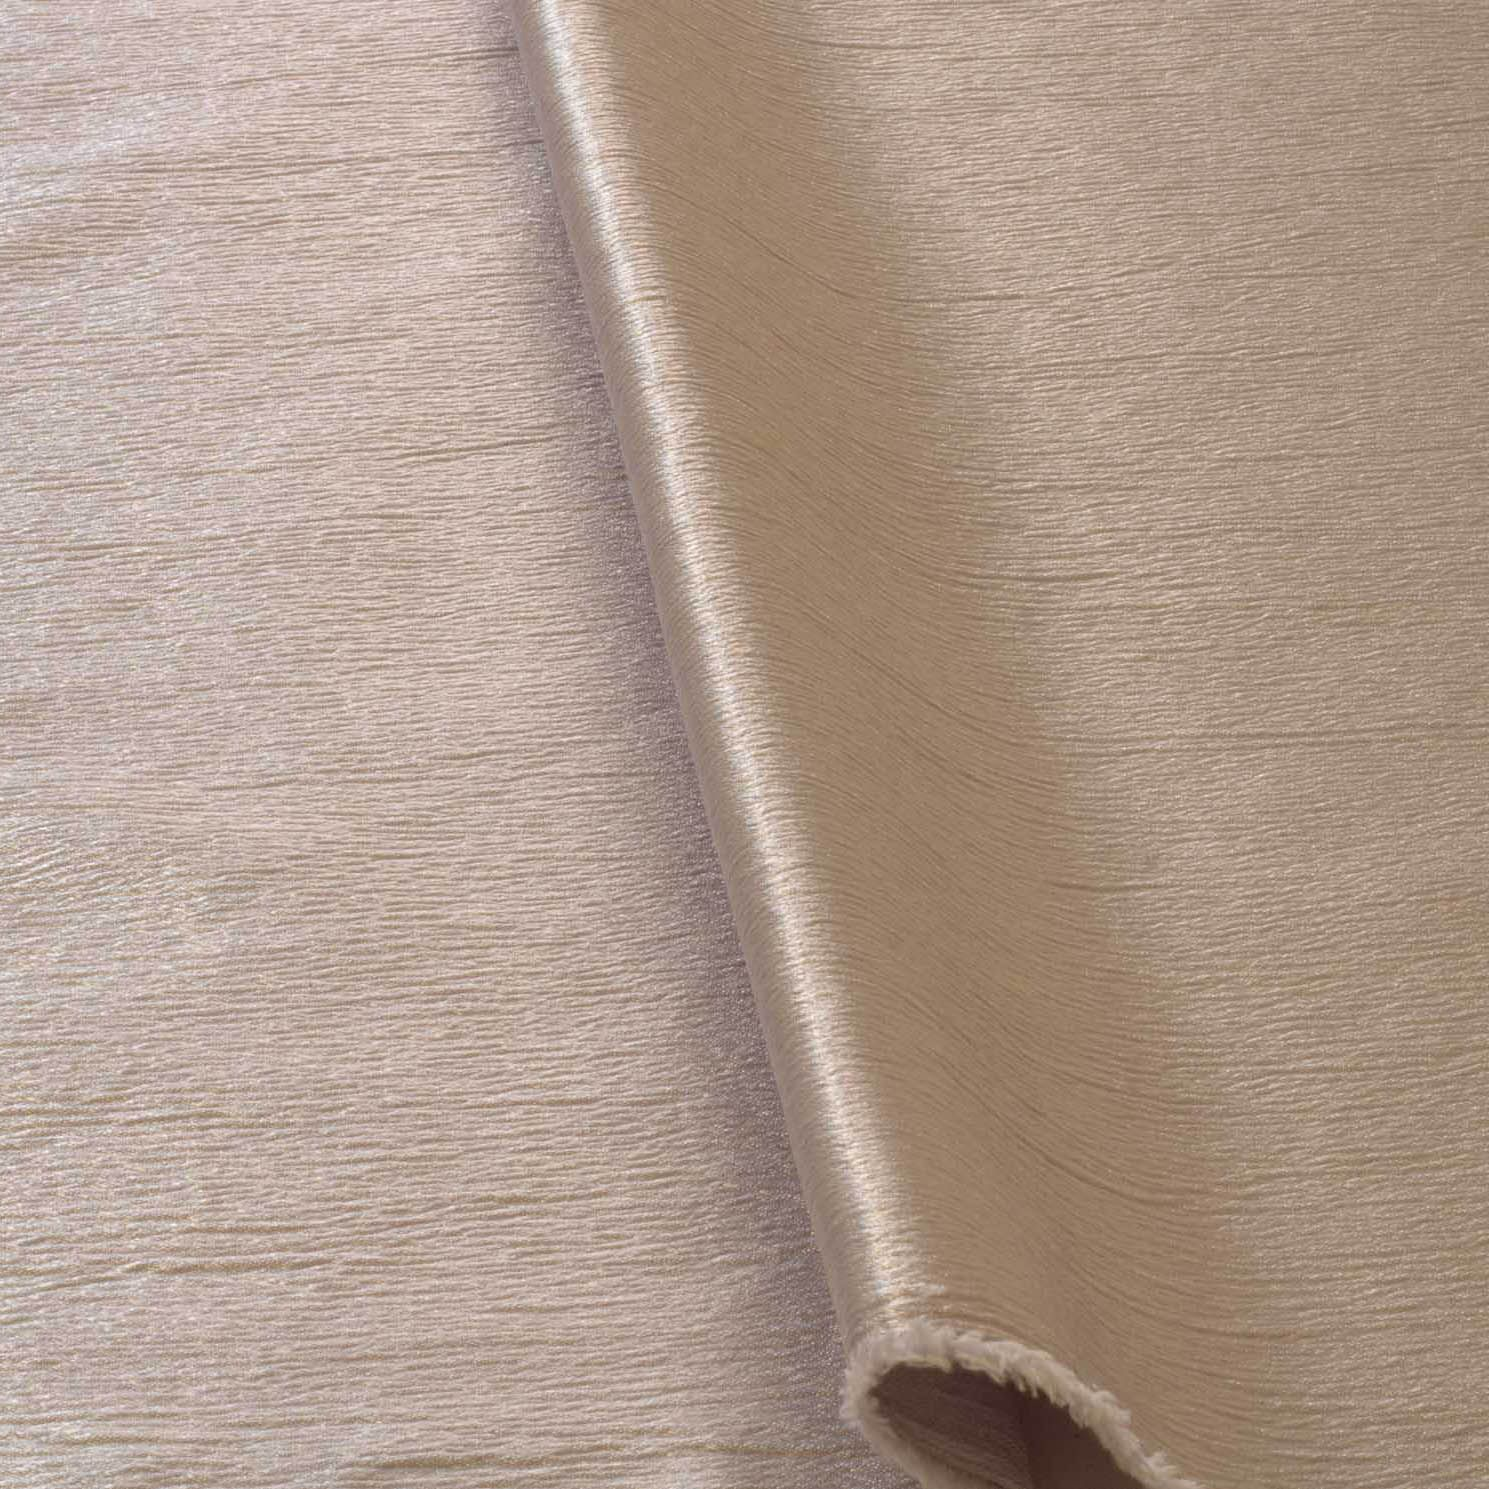 Tecido Crepe Kiwi Prata 100% Poliester 1,40 m Largura